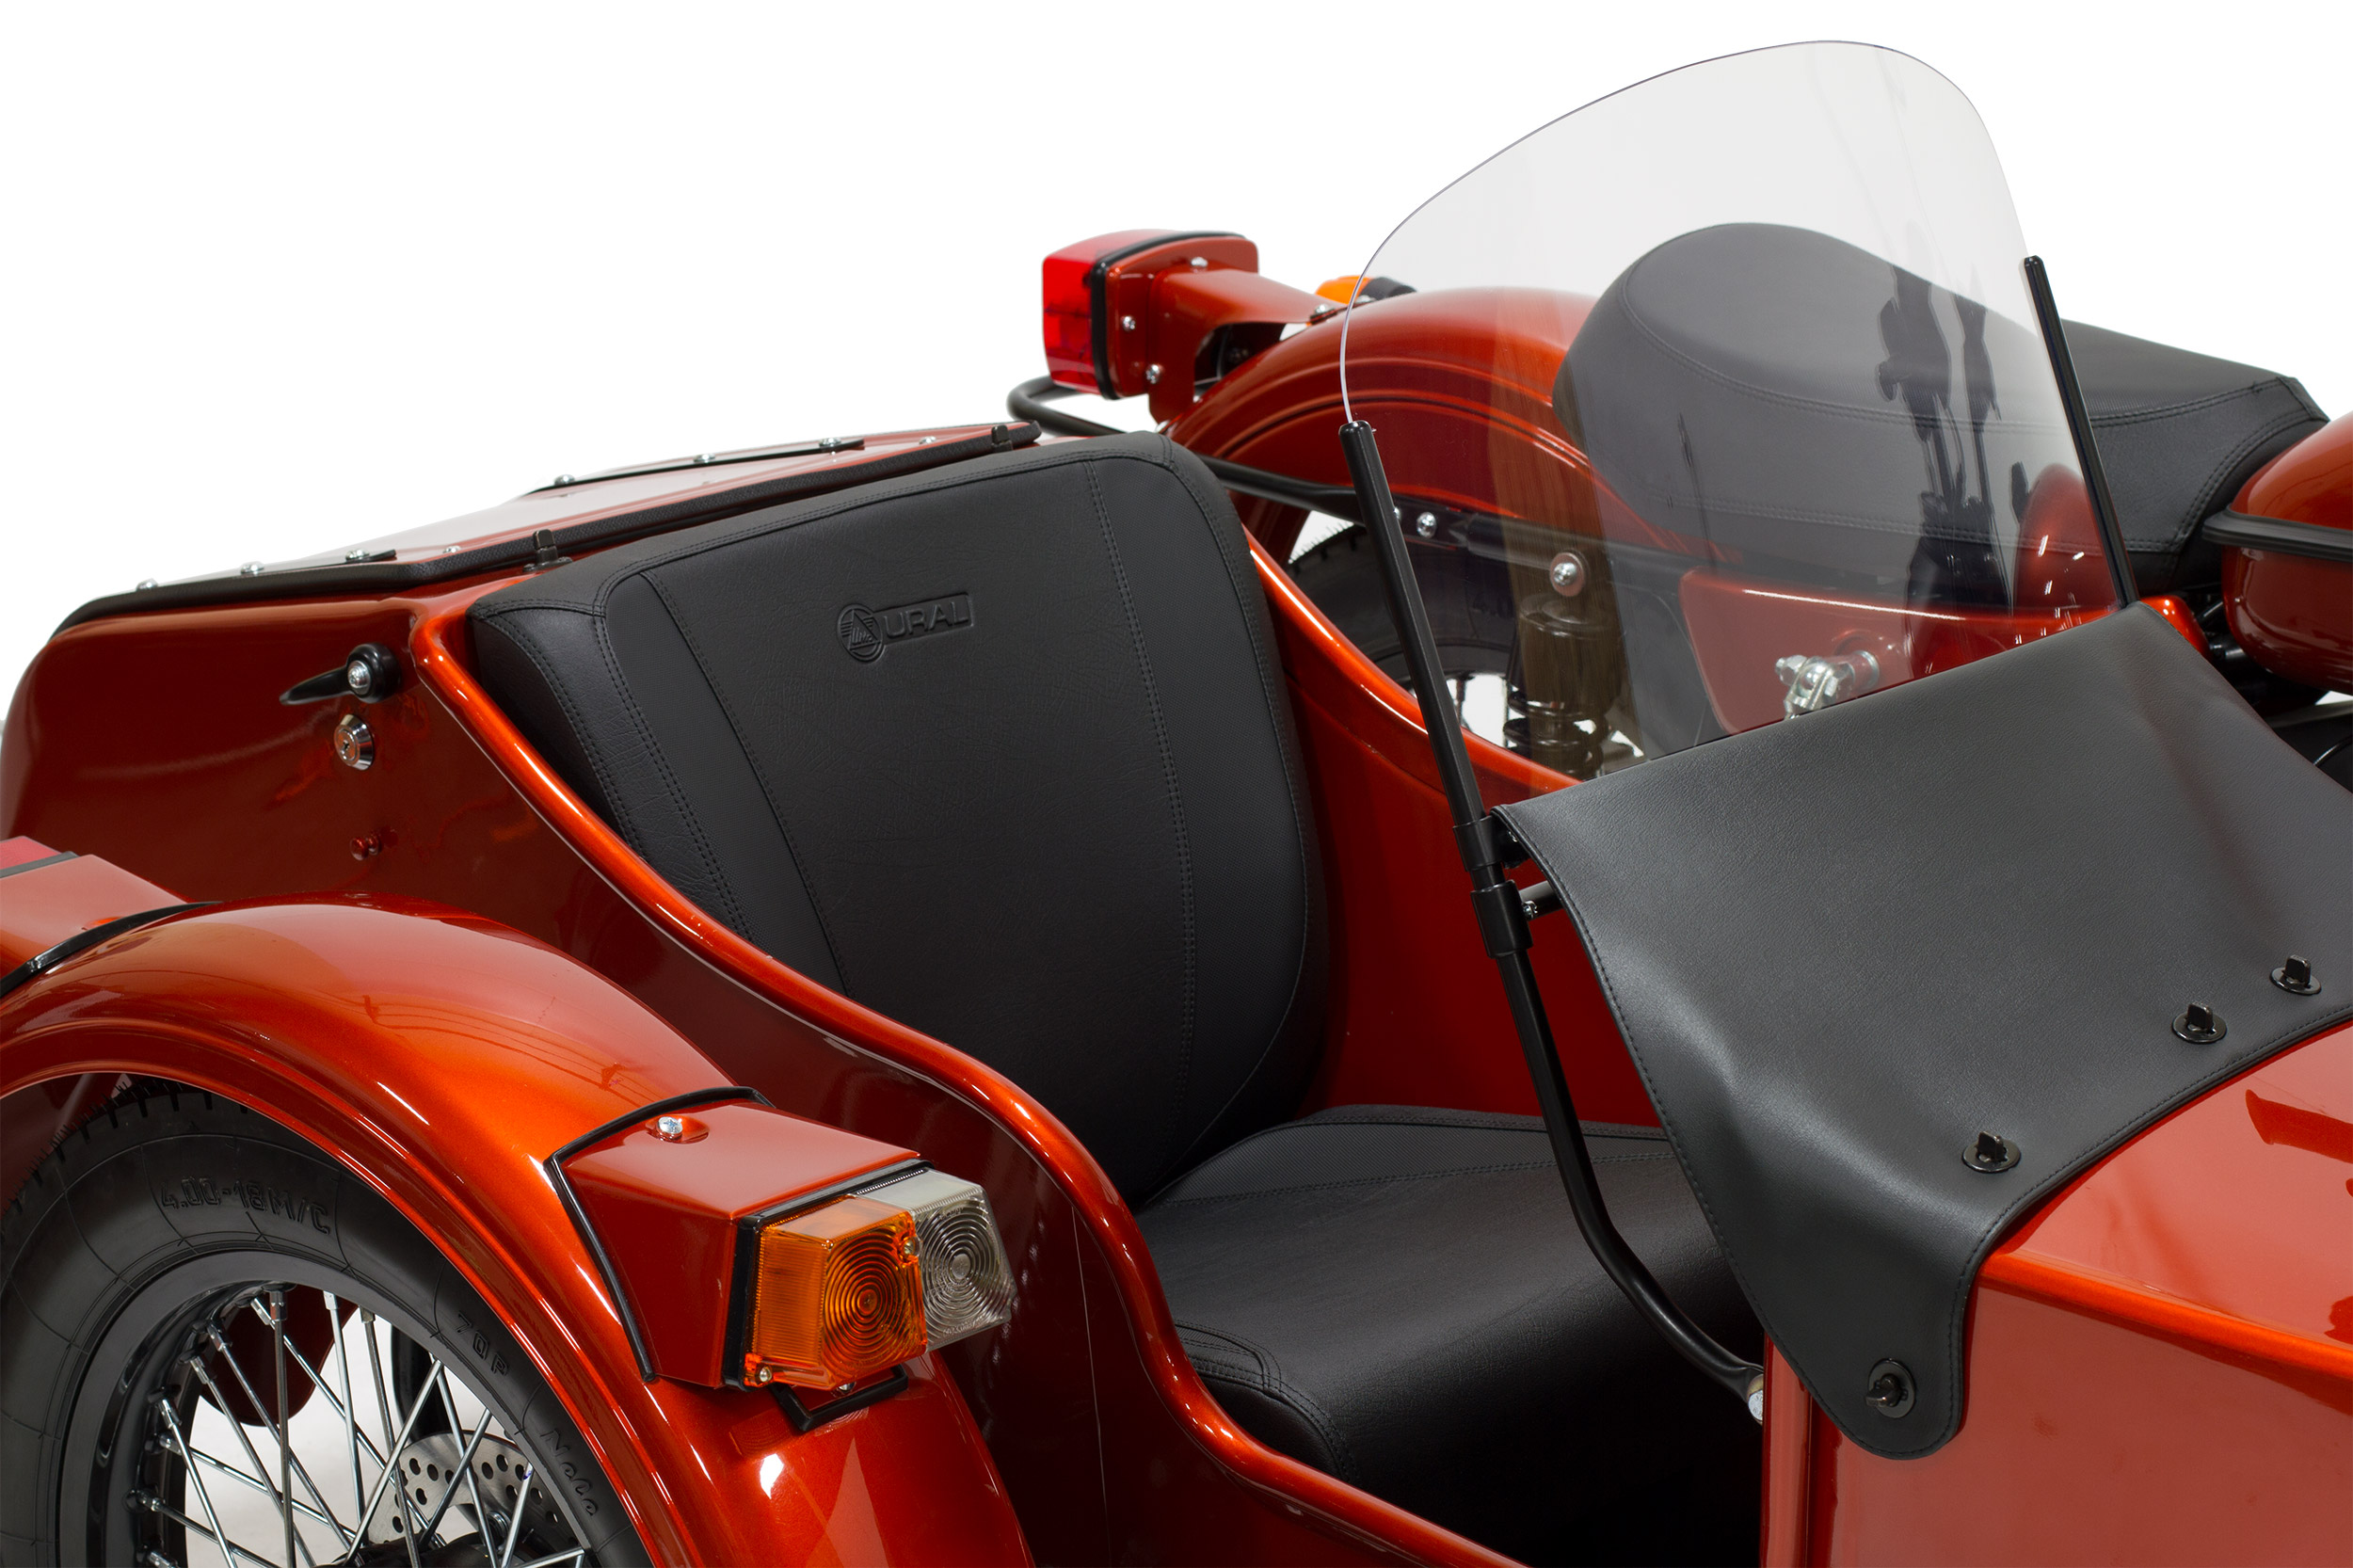 Seat Windshield Detail.jpg